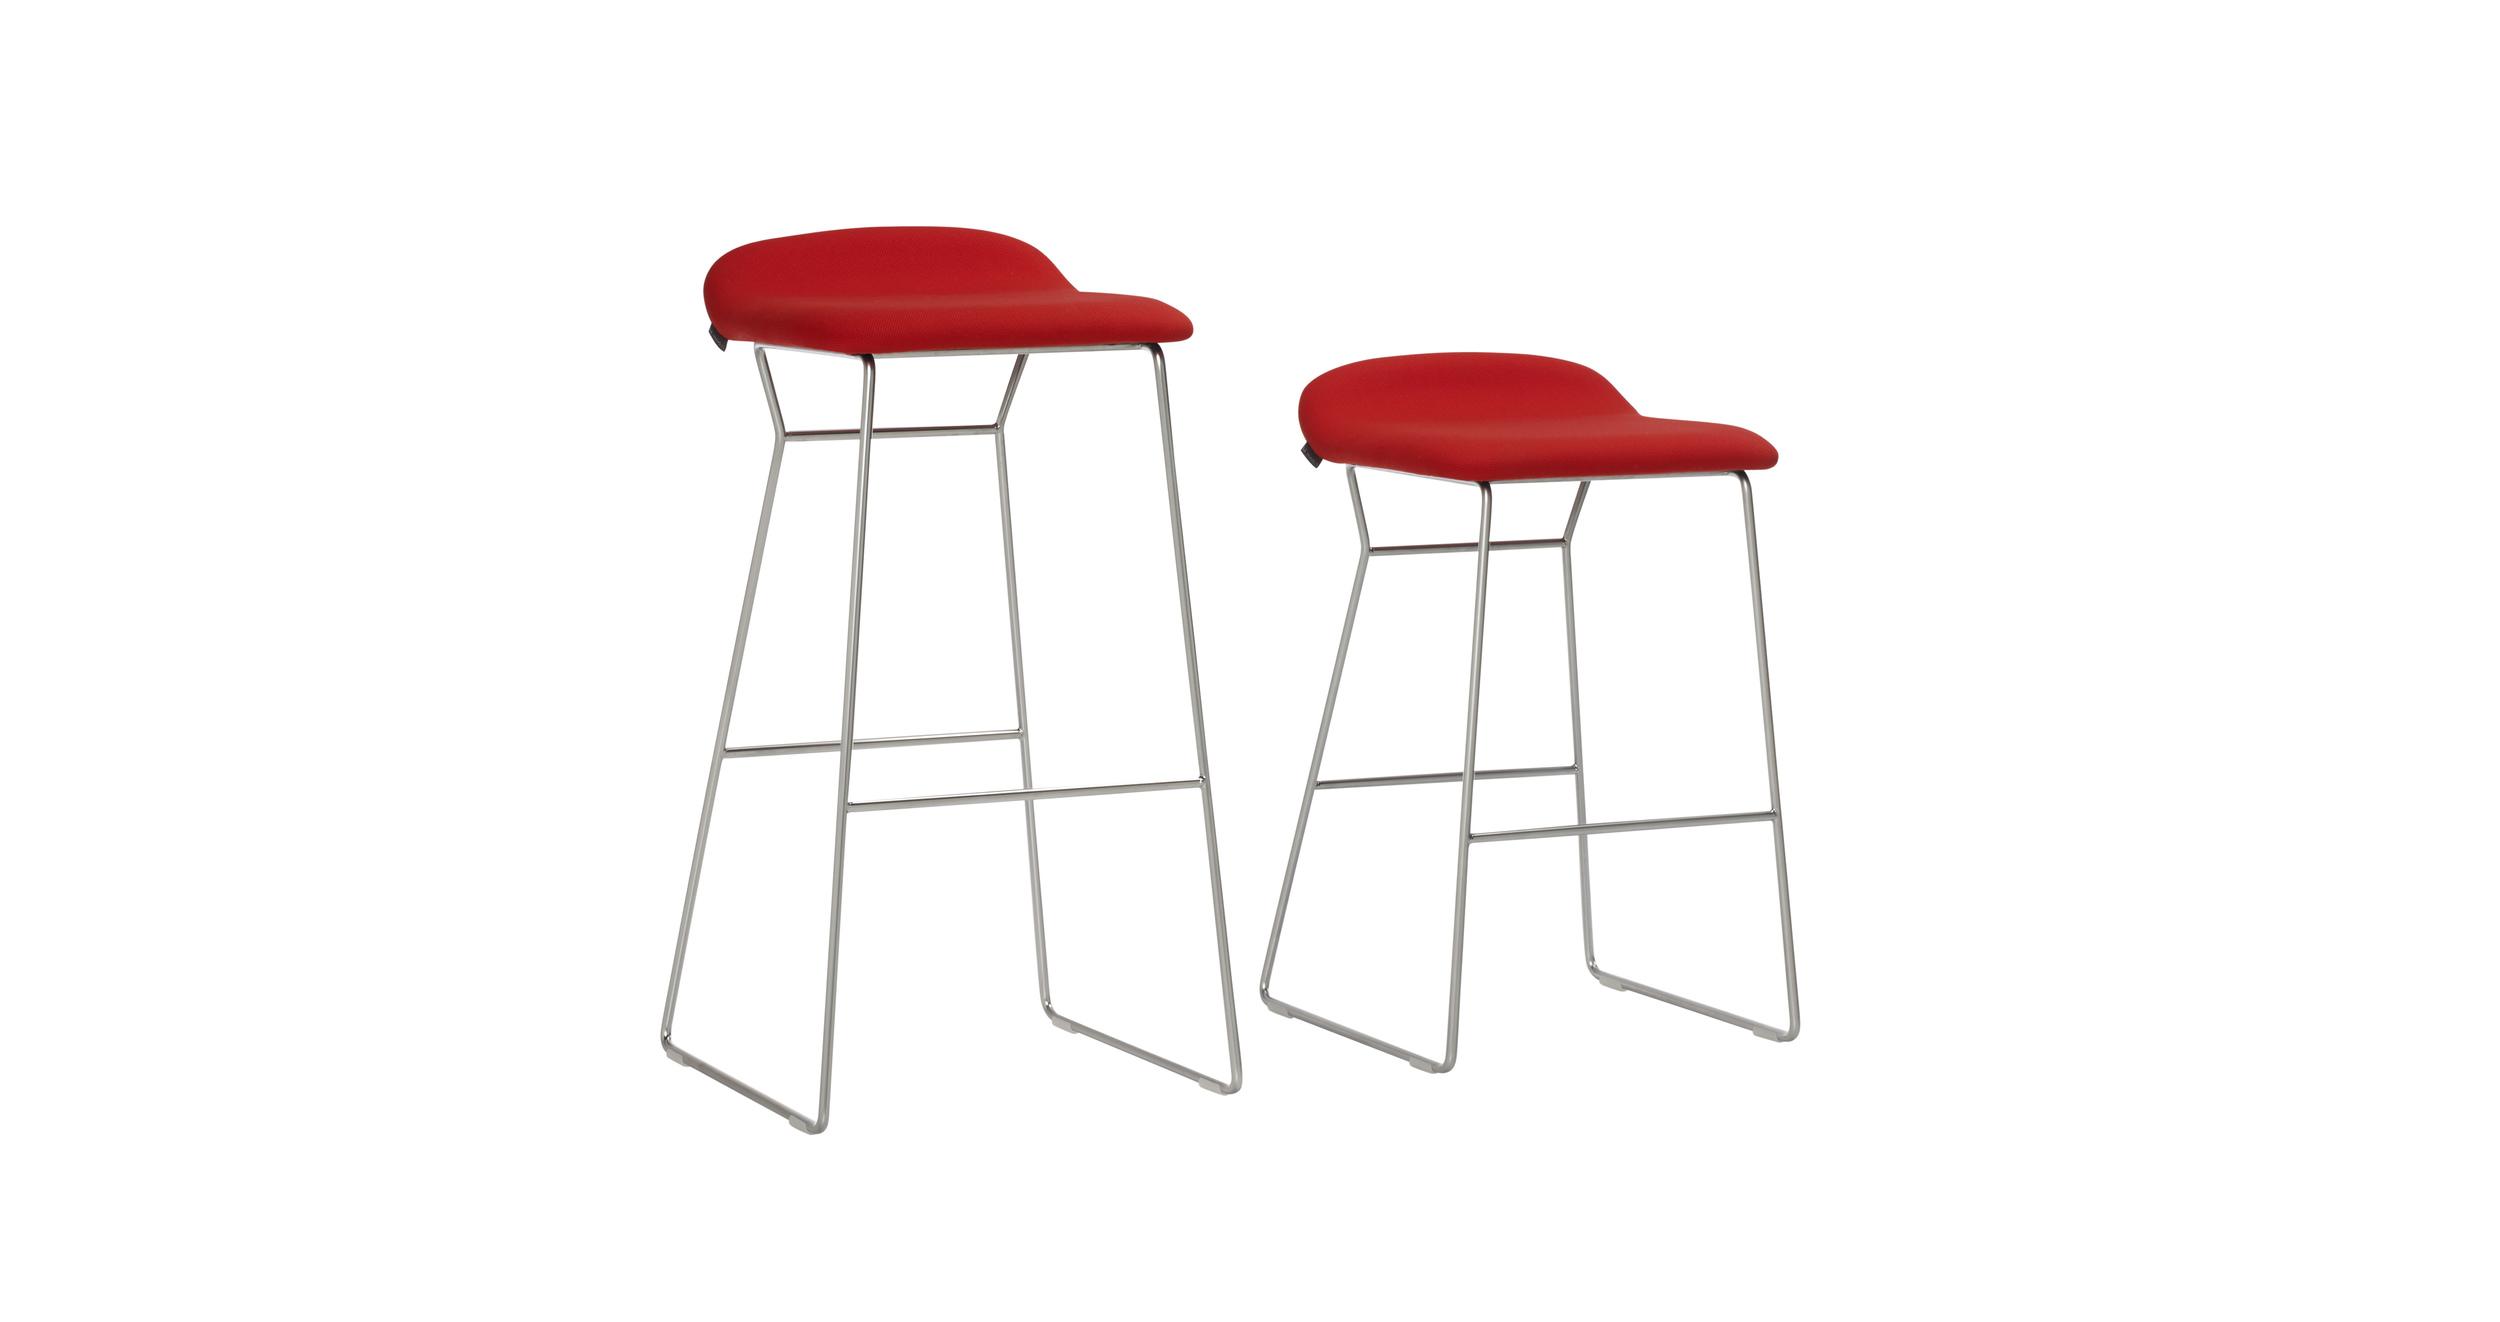 Multi bar stools by Michael Sodeau